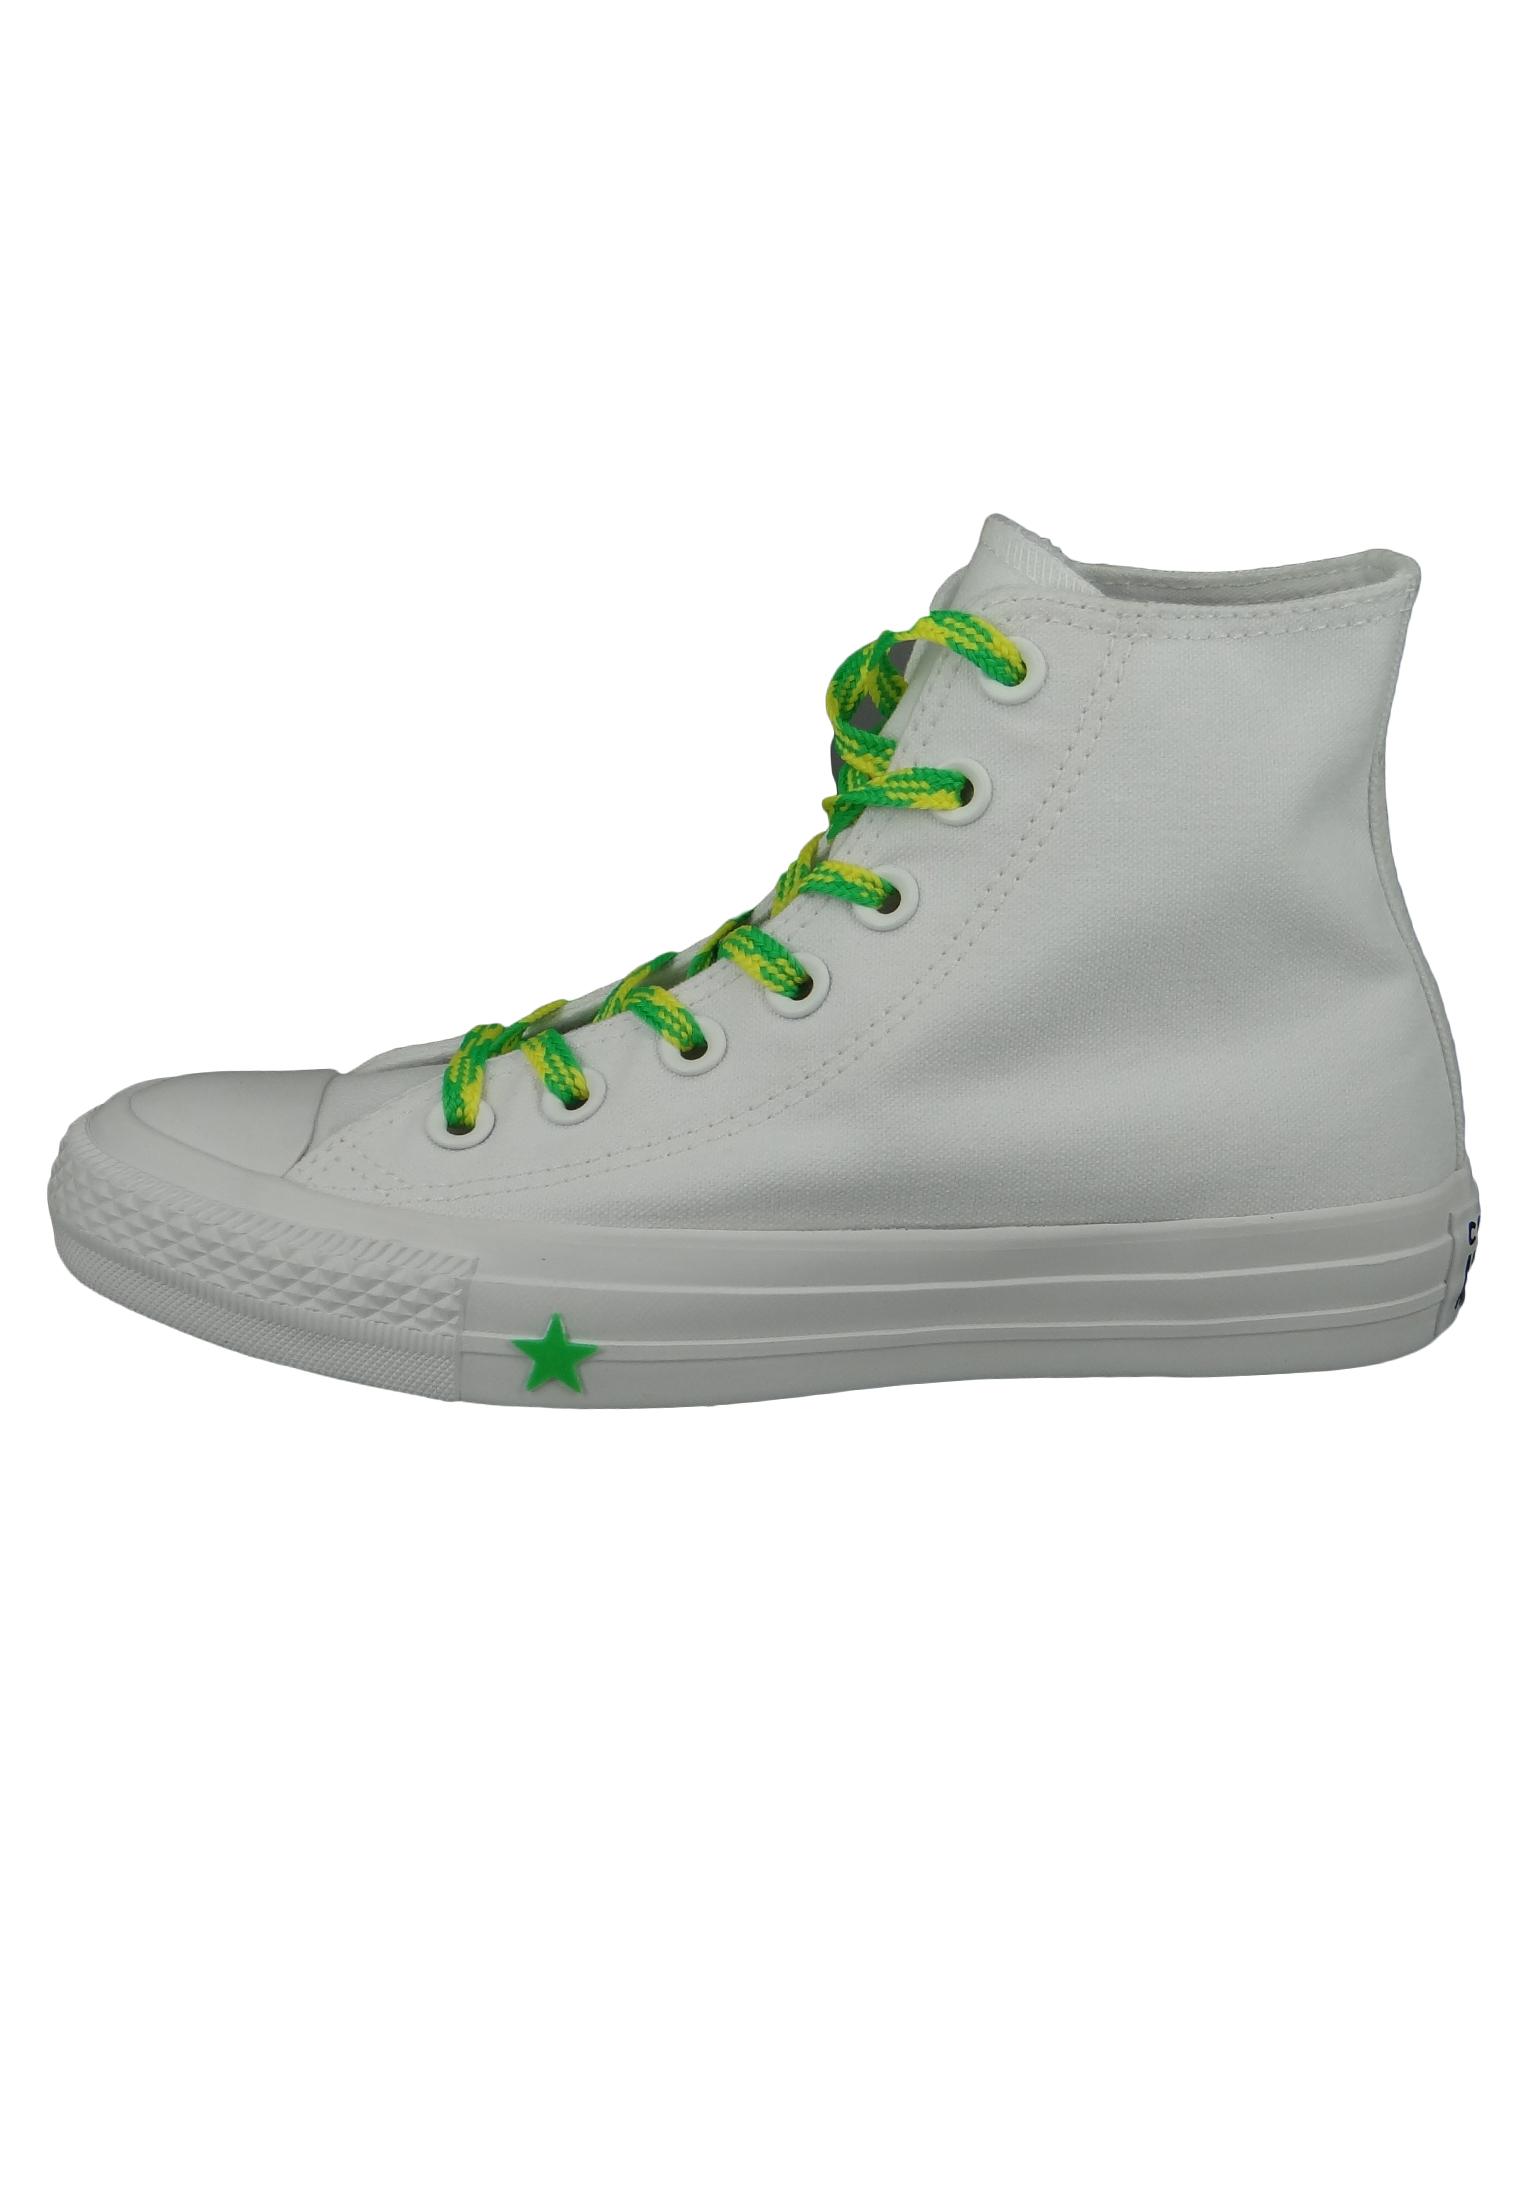 Converse Chucks Weiss 564123C Chuck Taylor All Star HI White Acid Green Fresh Yellow